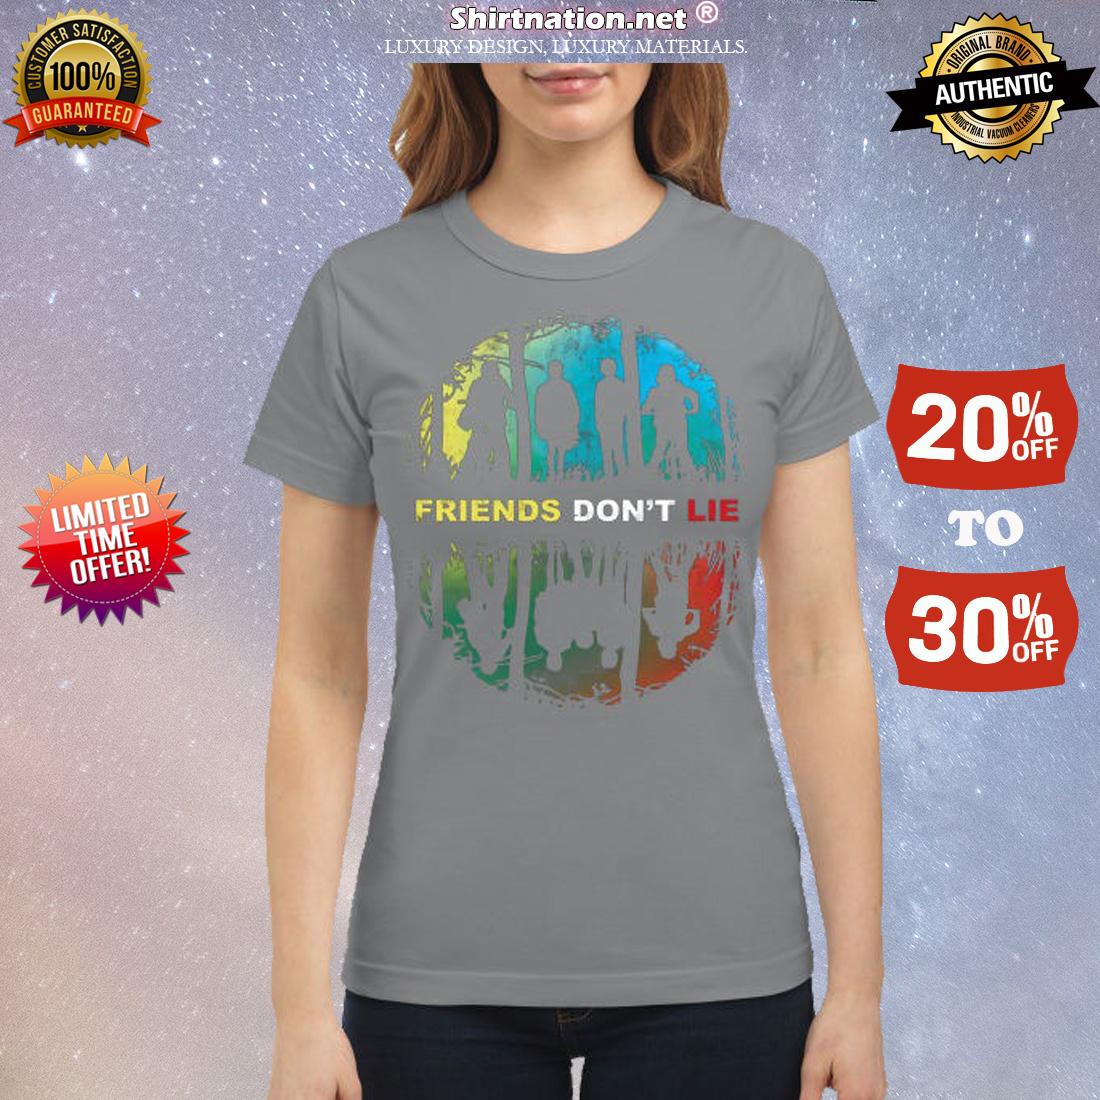 Stranger things friends don't lie classic shirt